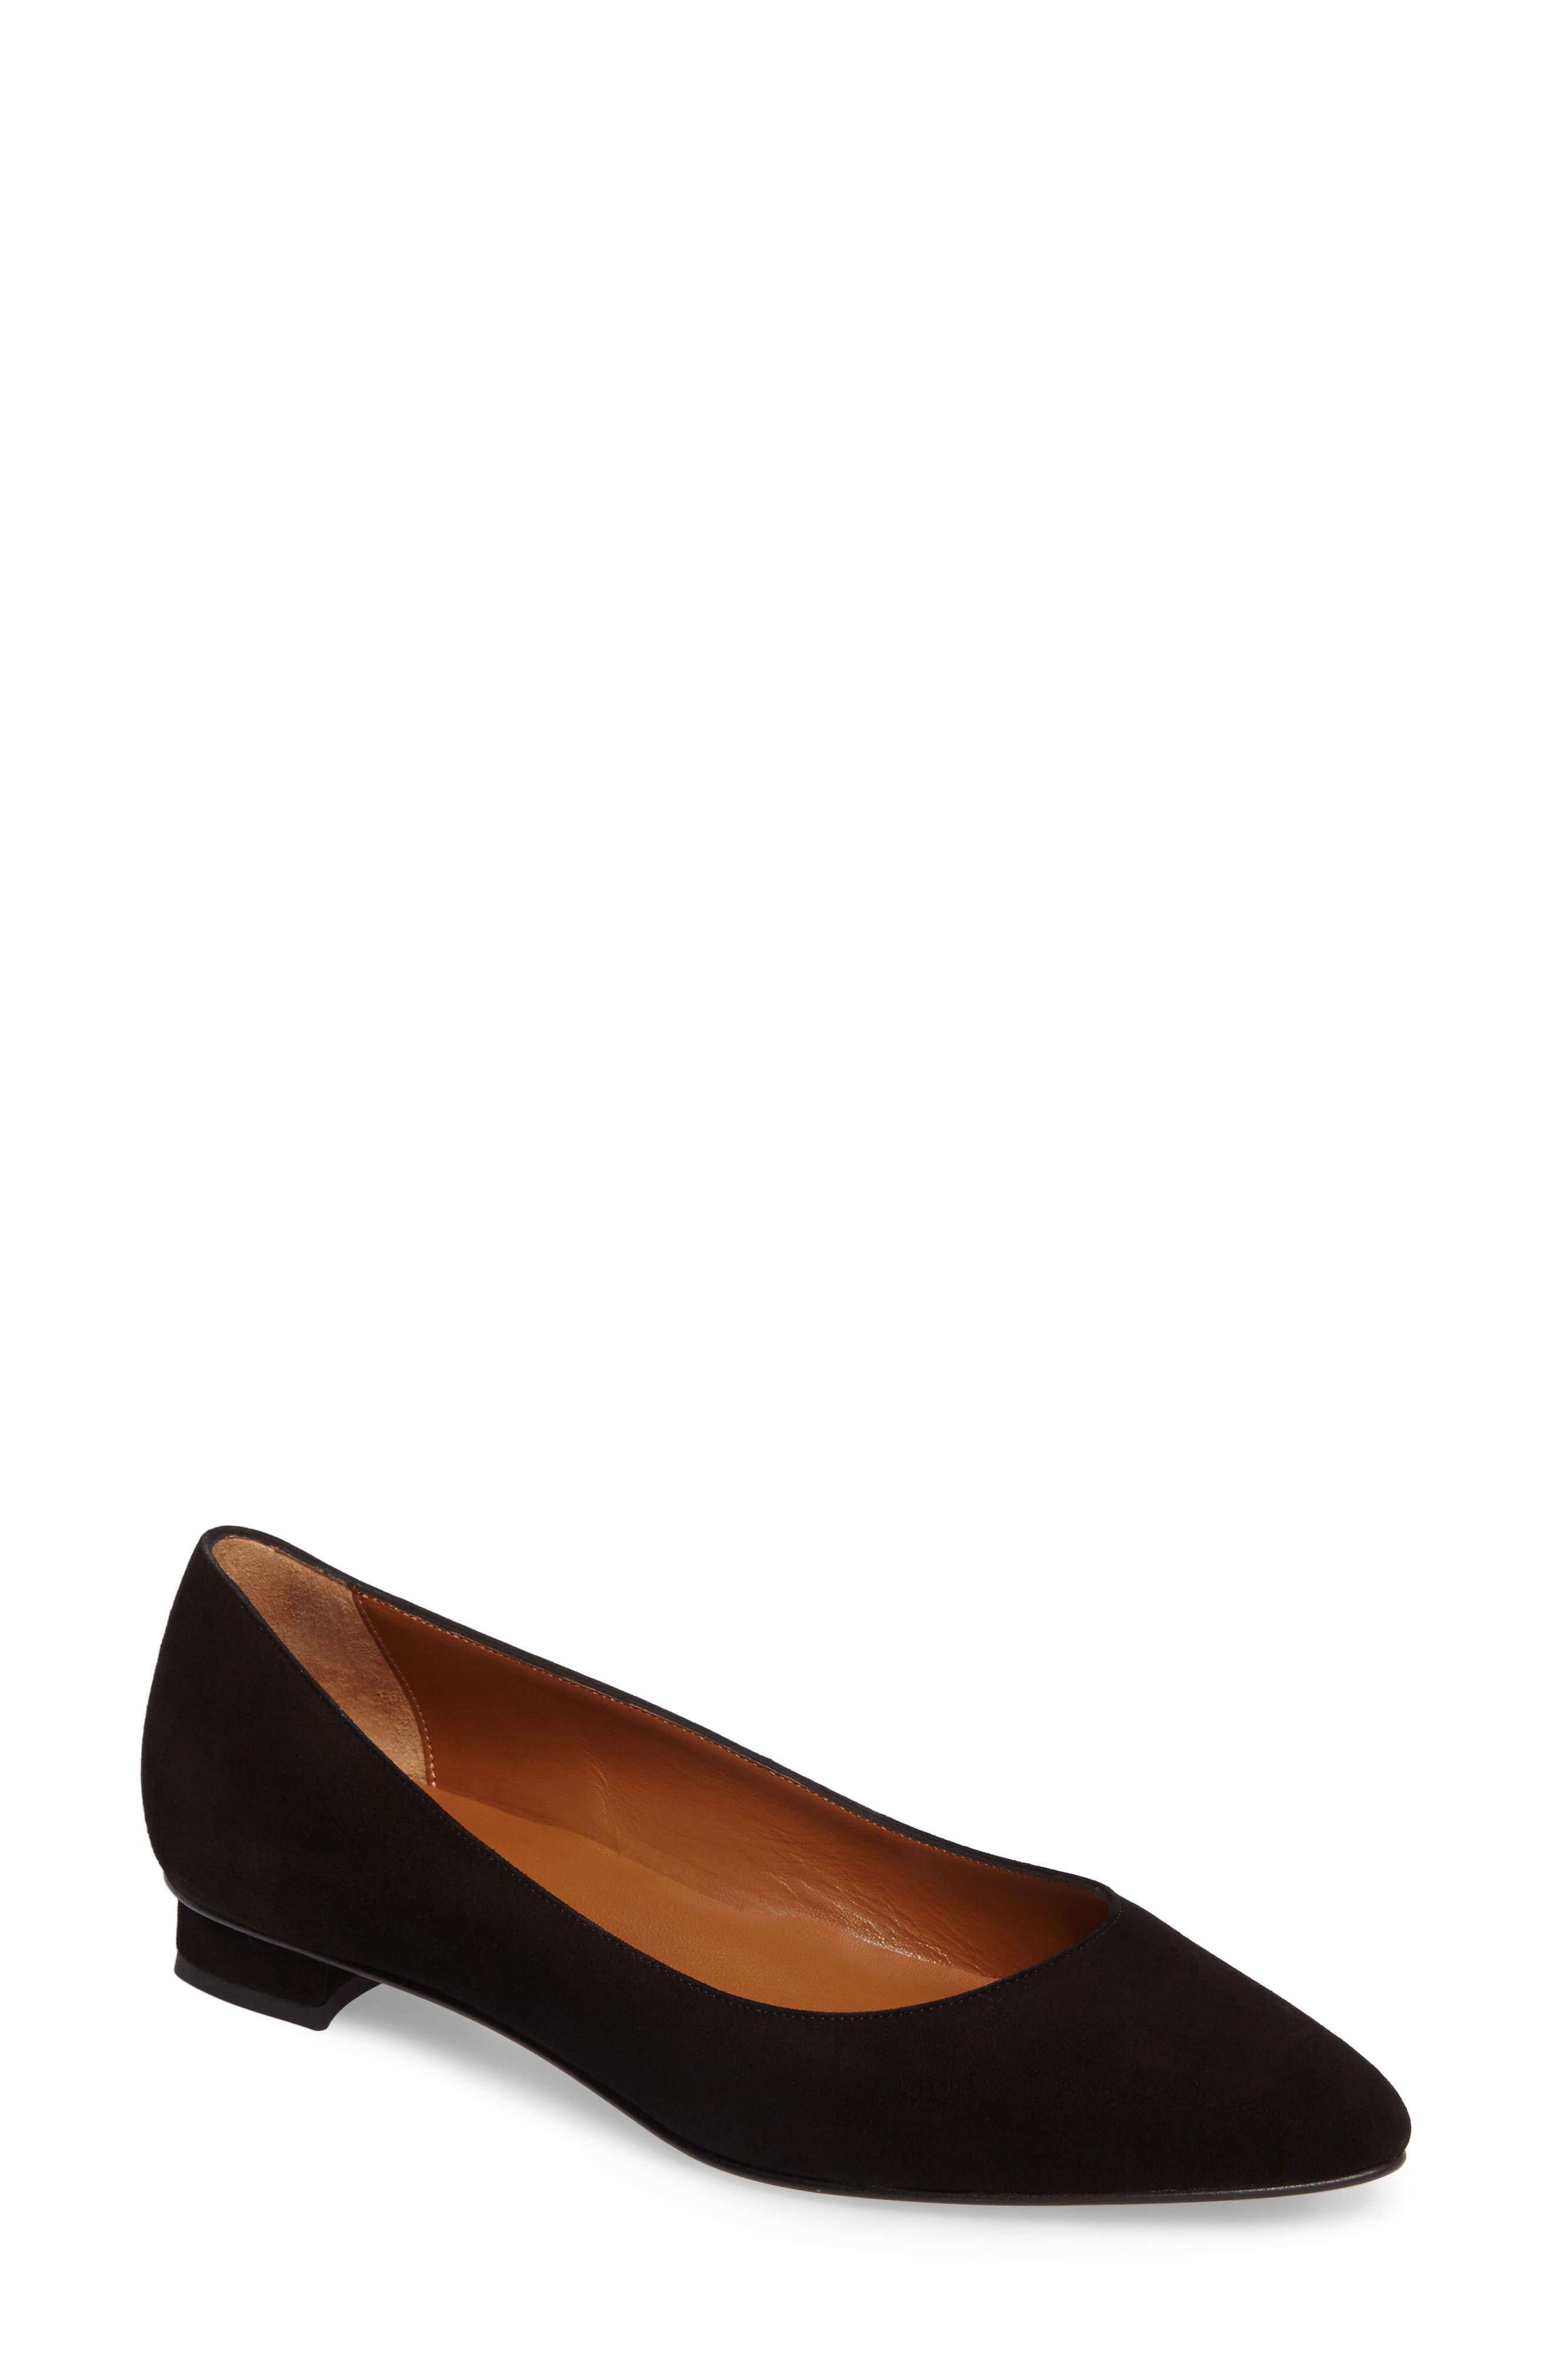 Perla Weatherproof Ballerina Shoe,                         Main,                         color, Black Suede